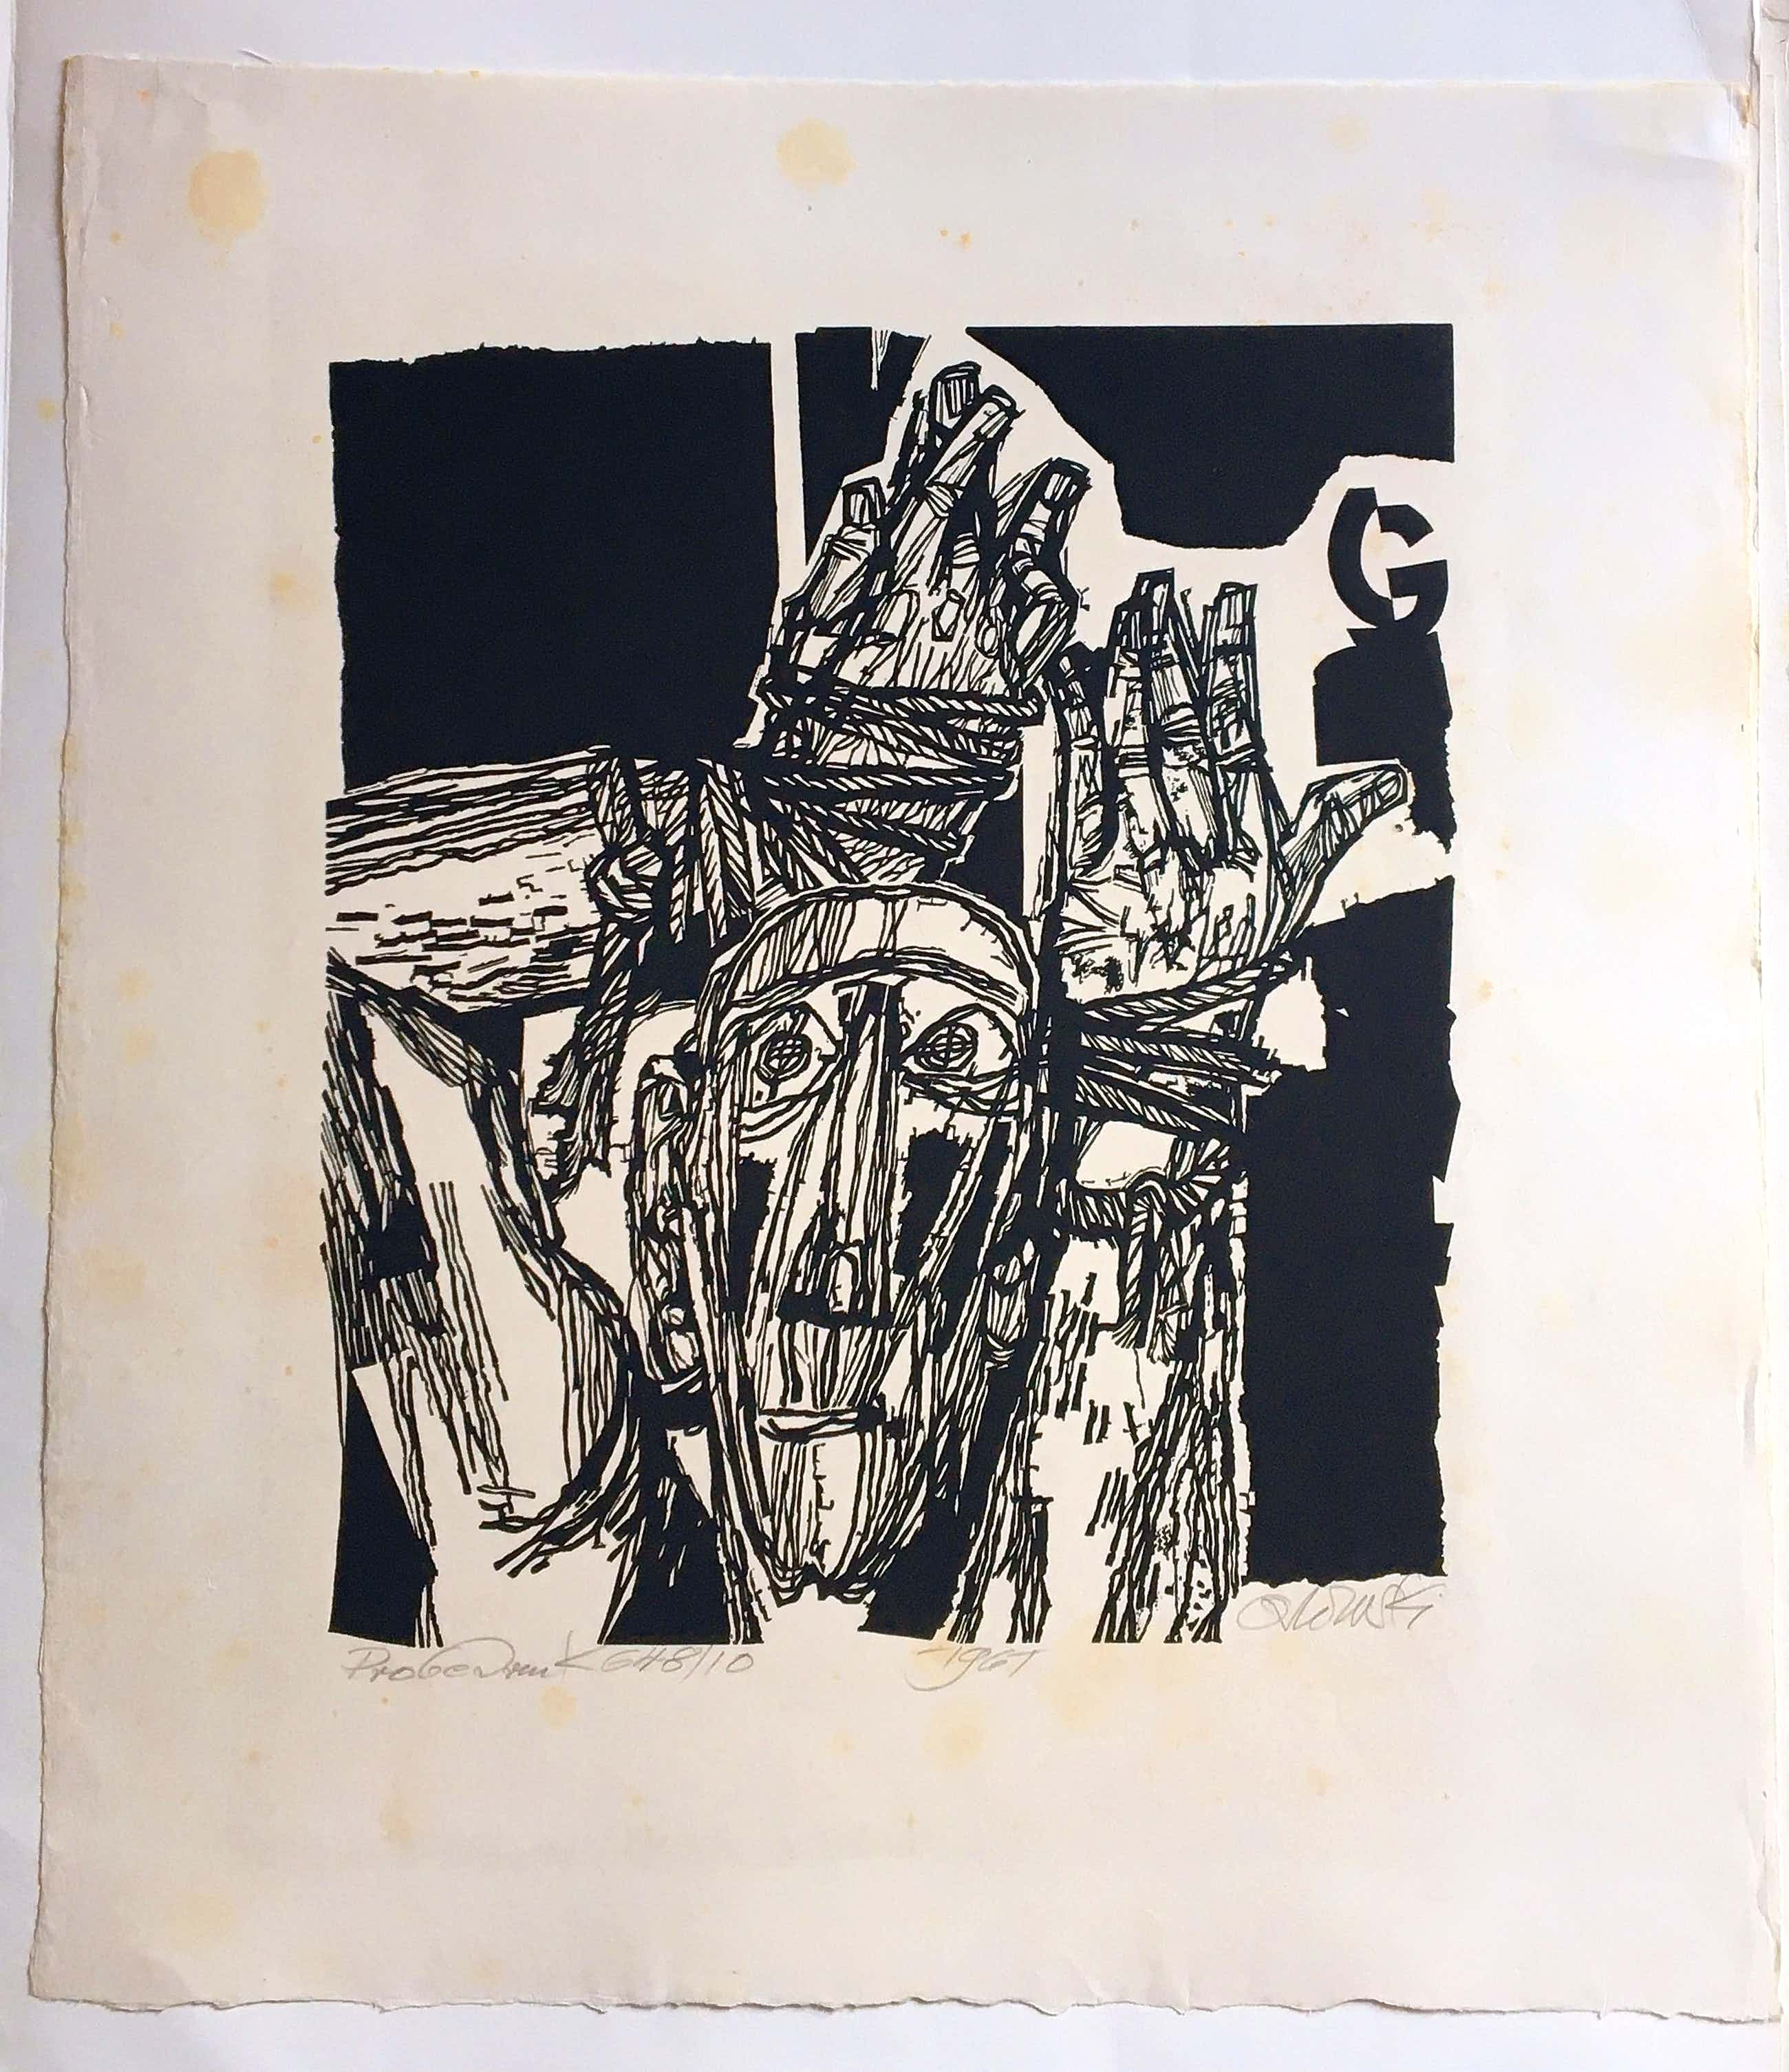 Hans Orlowski - Ohne Titel, 1961 kopen? Bied vanaf 65!